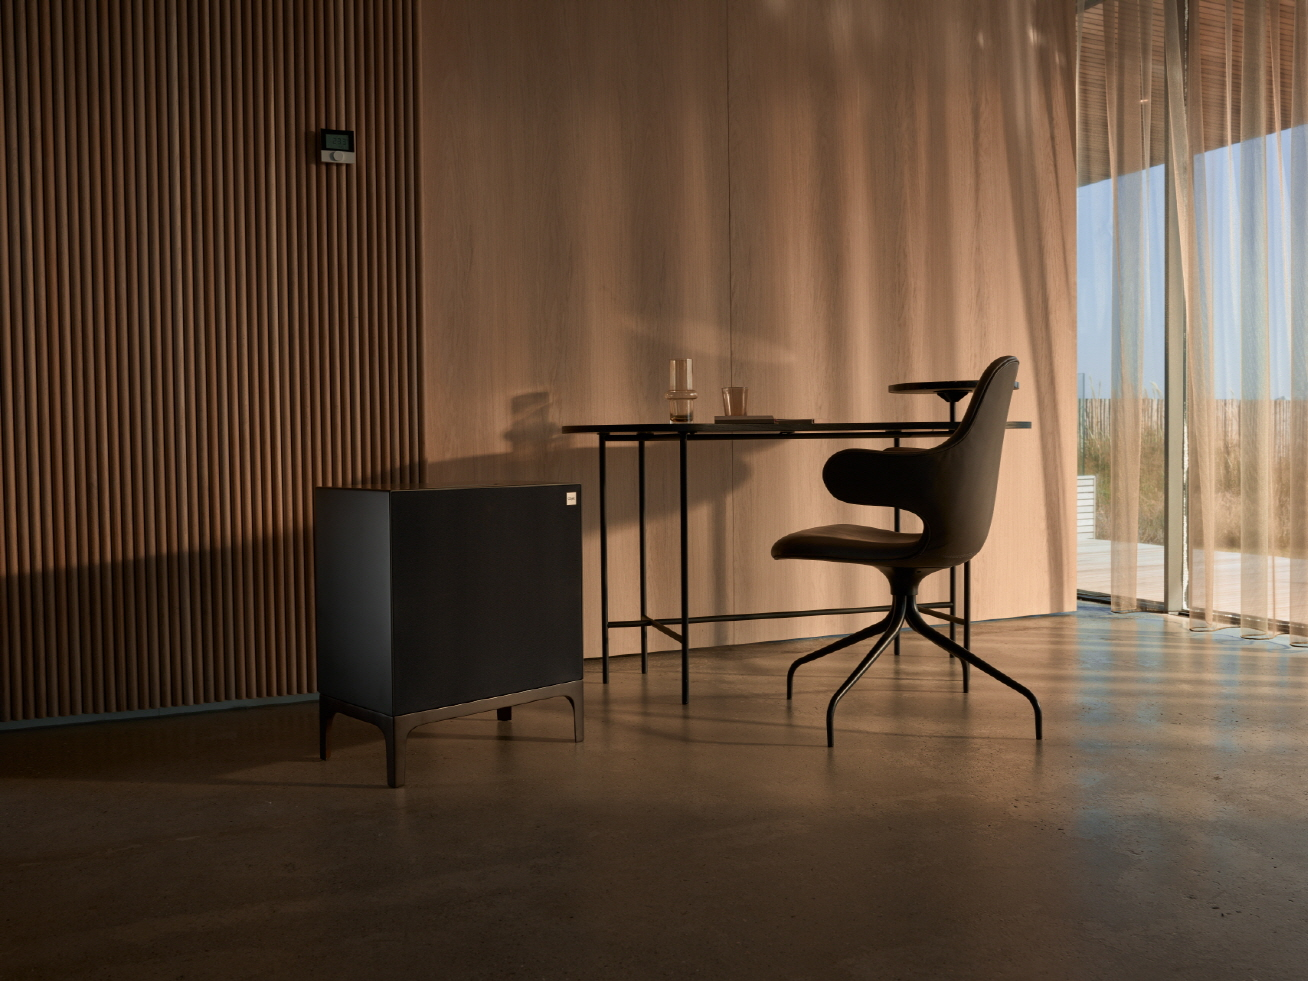 'LG 오브제(LG Objet)'는 나만의 공간과 시간을 완성시켜주는 프리미엄 프라이빗 가전(Premium Private Appliance)이다. 가전(家電)과 가구(家具)를 결합한 신개념 융복합 가전으로 인테리어와 조화를 이루는 차별화된 디자인으로 더욱 아름다운 공간을 연출할 수 있다. 사진은 LG 오브제 4가지 제품 중 오디오.